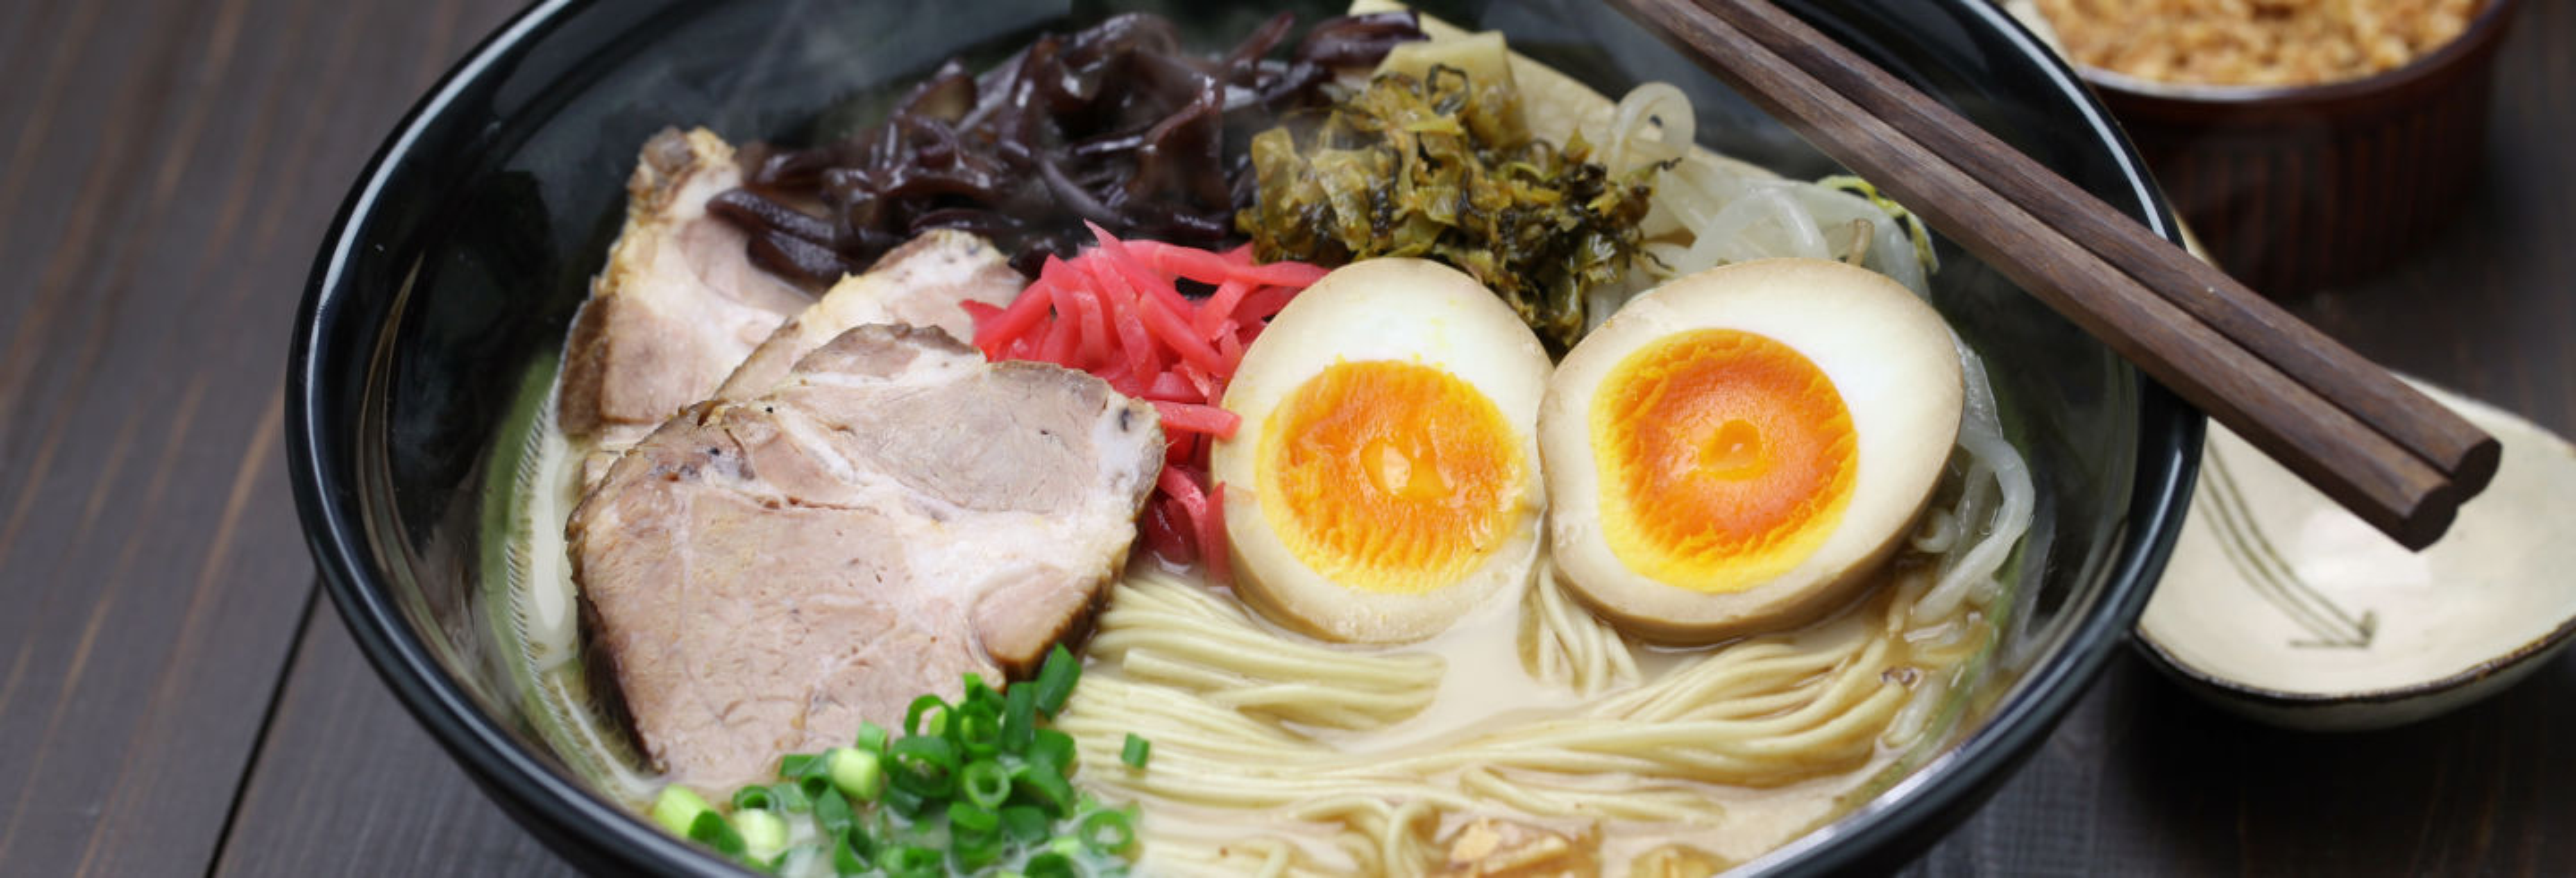 Visite gastronomique dans Shinjuku